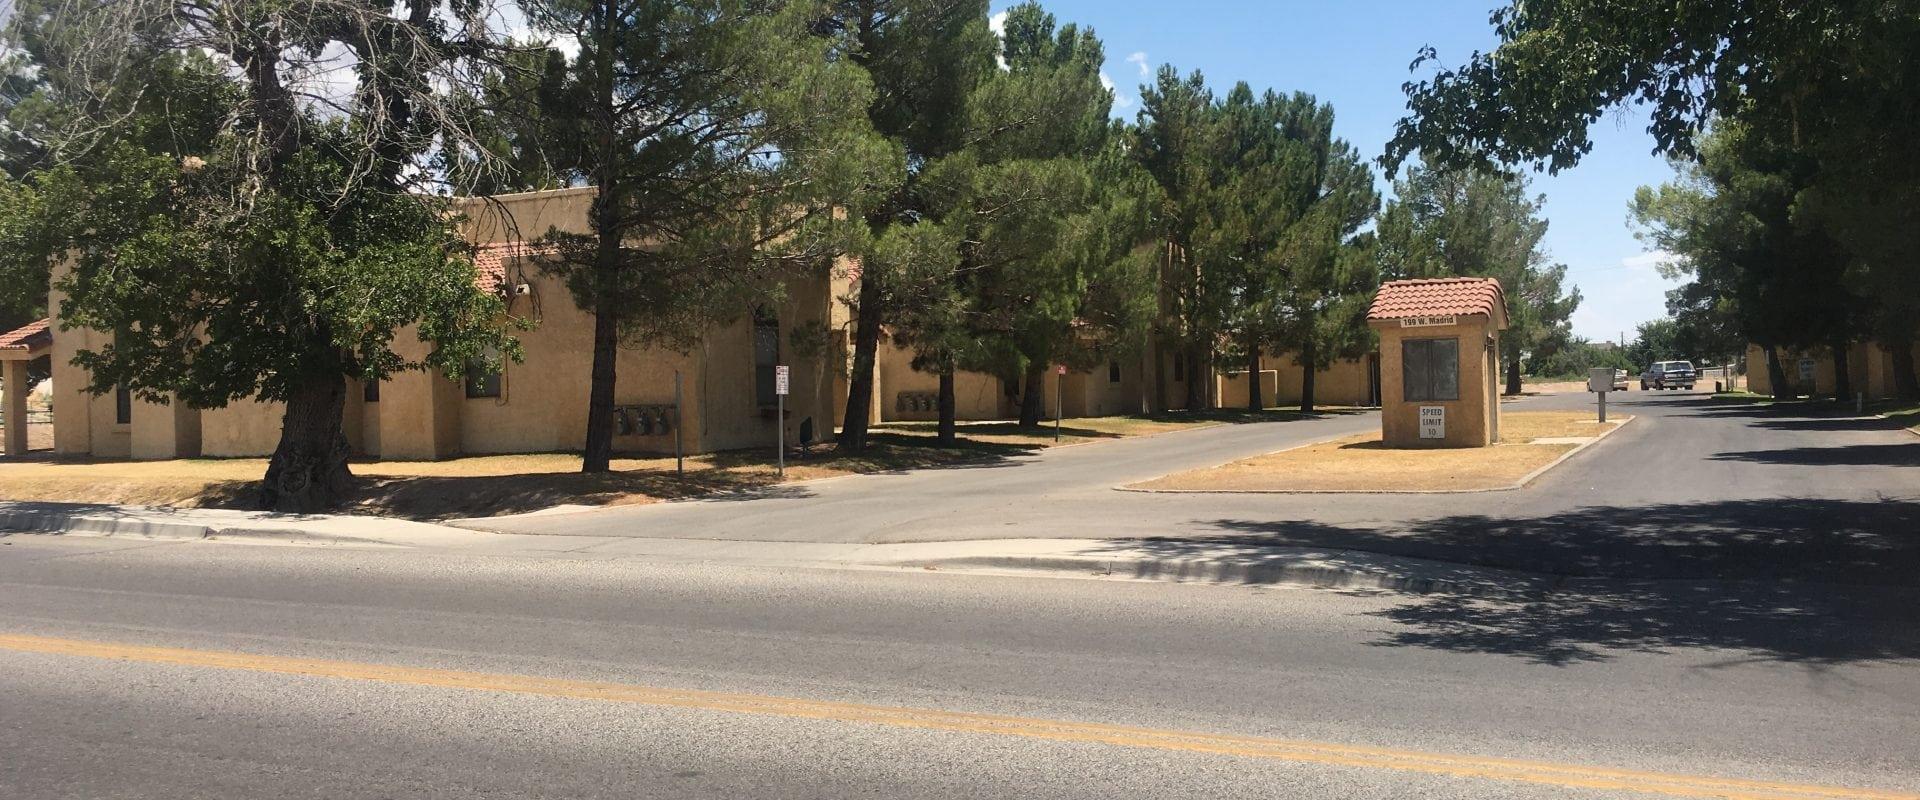 199 W. Madrid Road #G2, Las Cruces, NM 88005